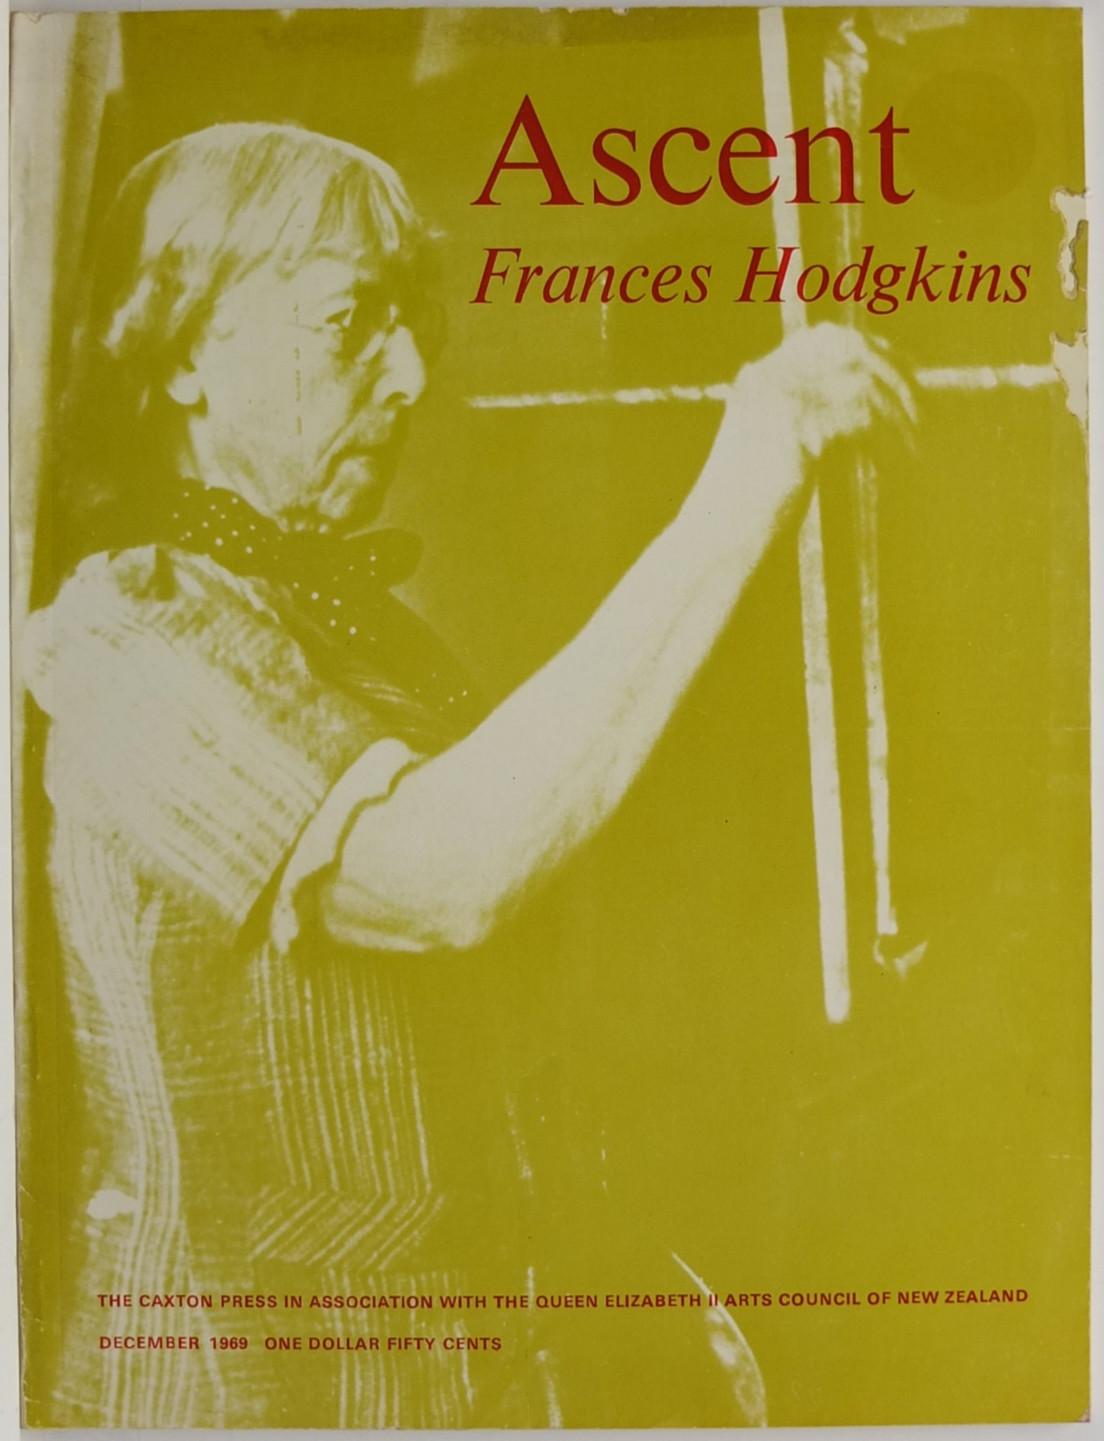 Ascent - Frances Hodgkins